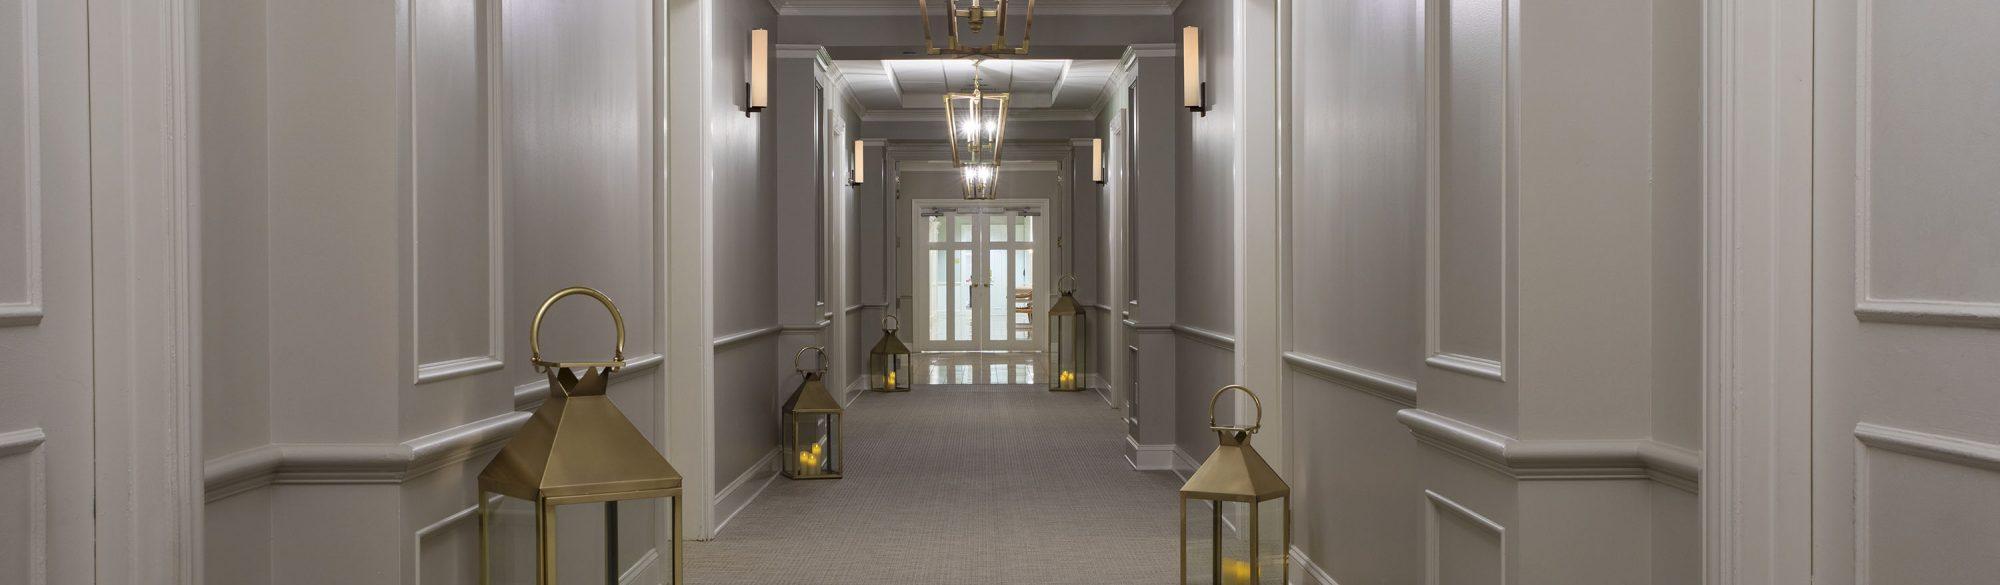 The Spa at Ballantyne Treatment Corridor